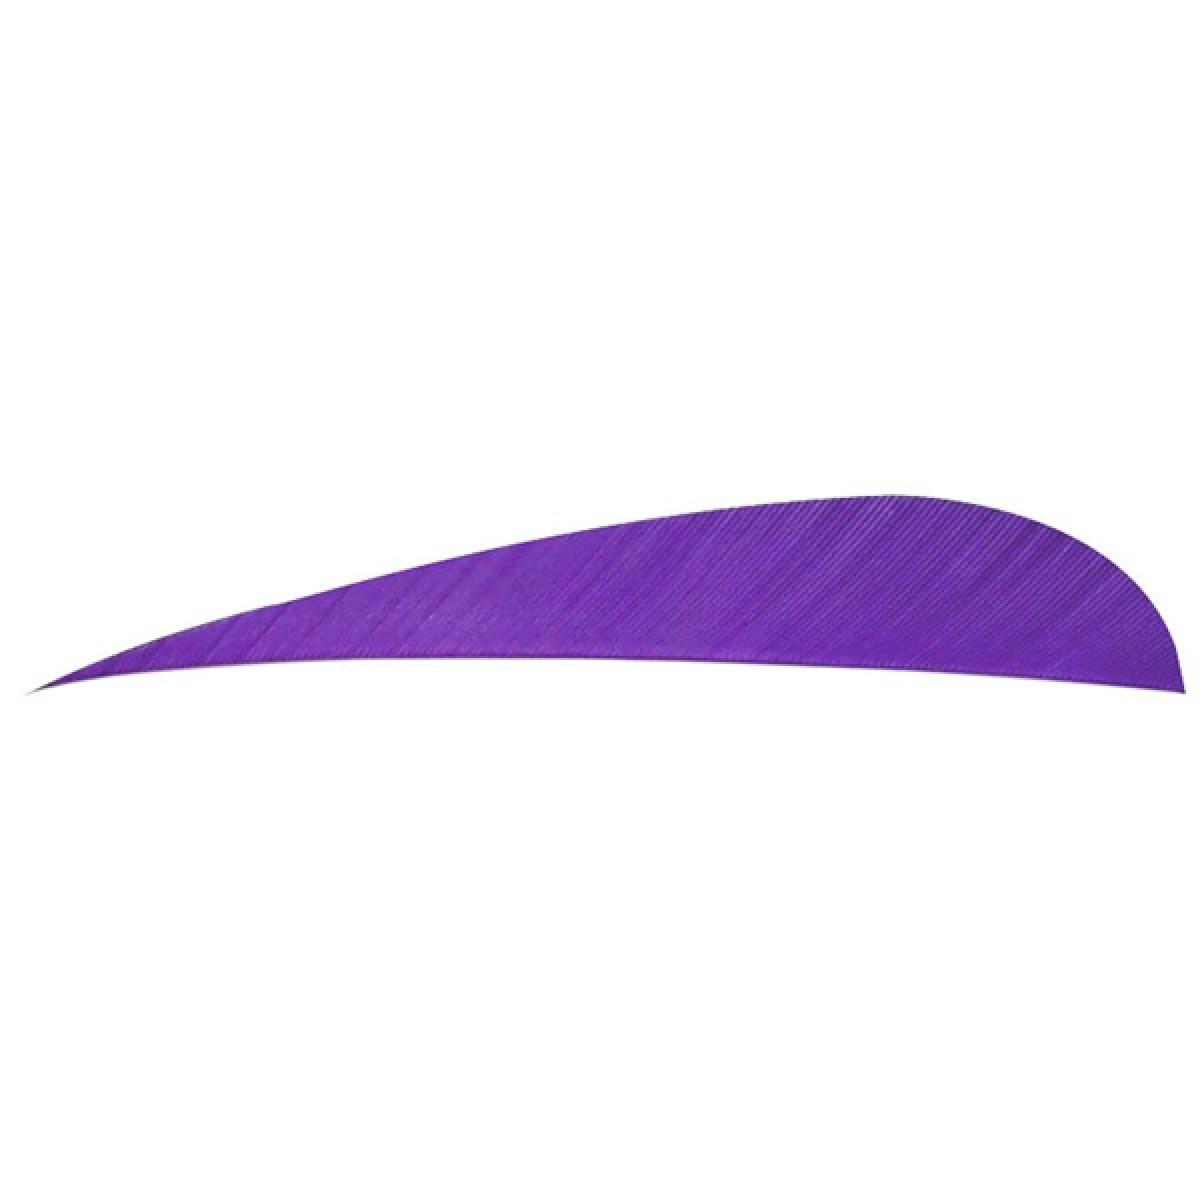 Перо AMG Feathers 3 Parabolic RW (12 штук)